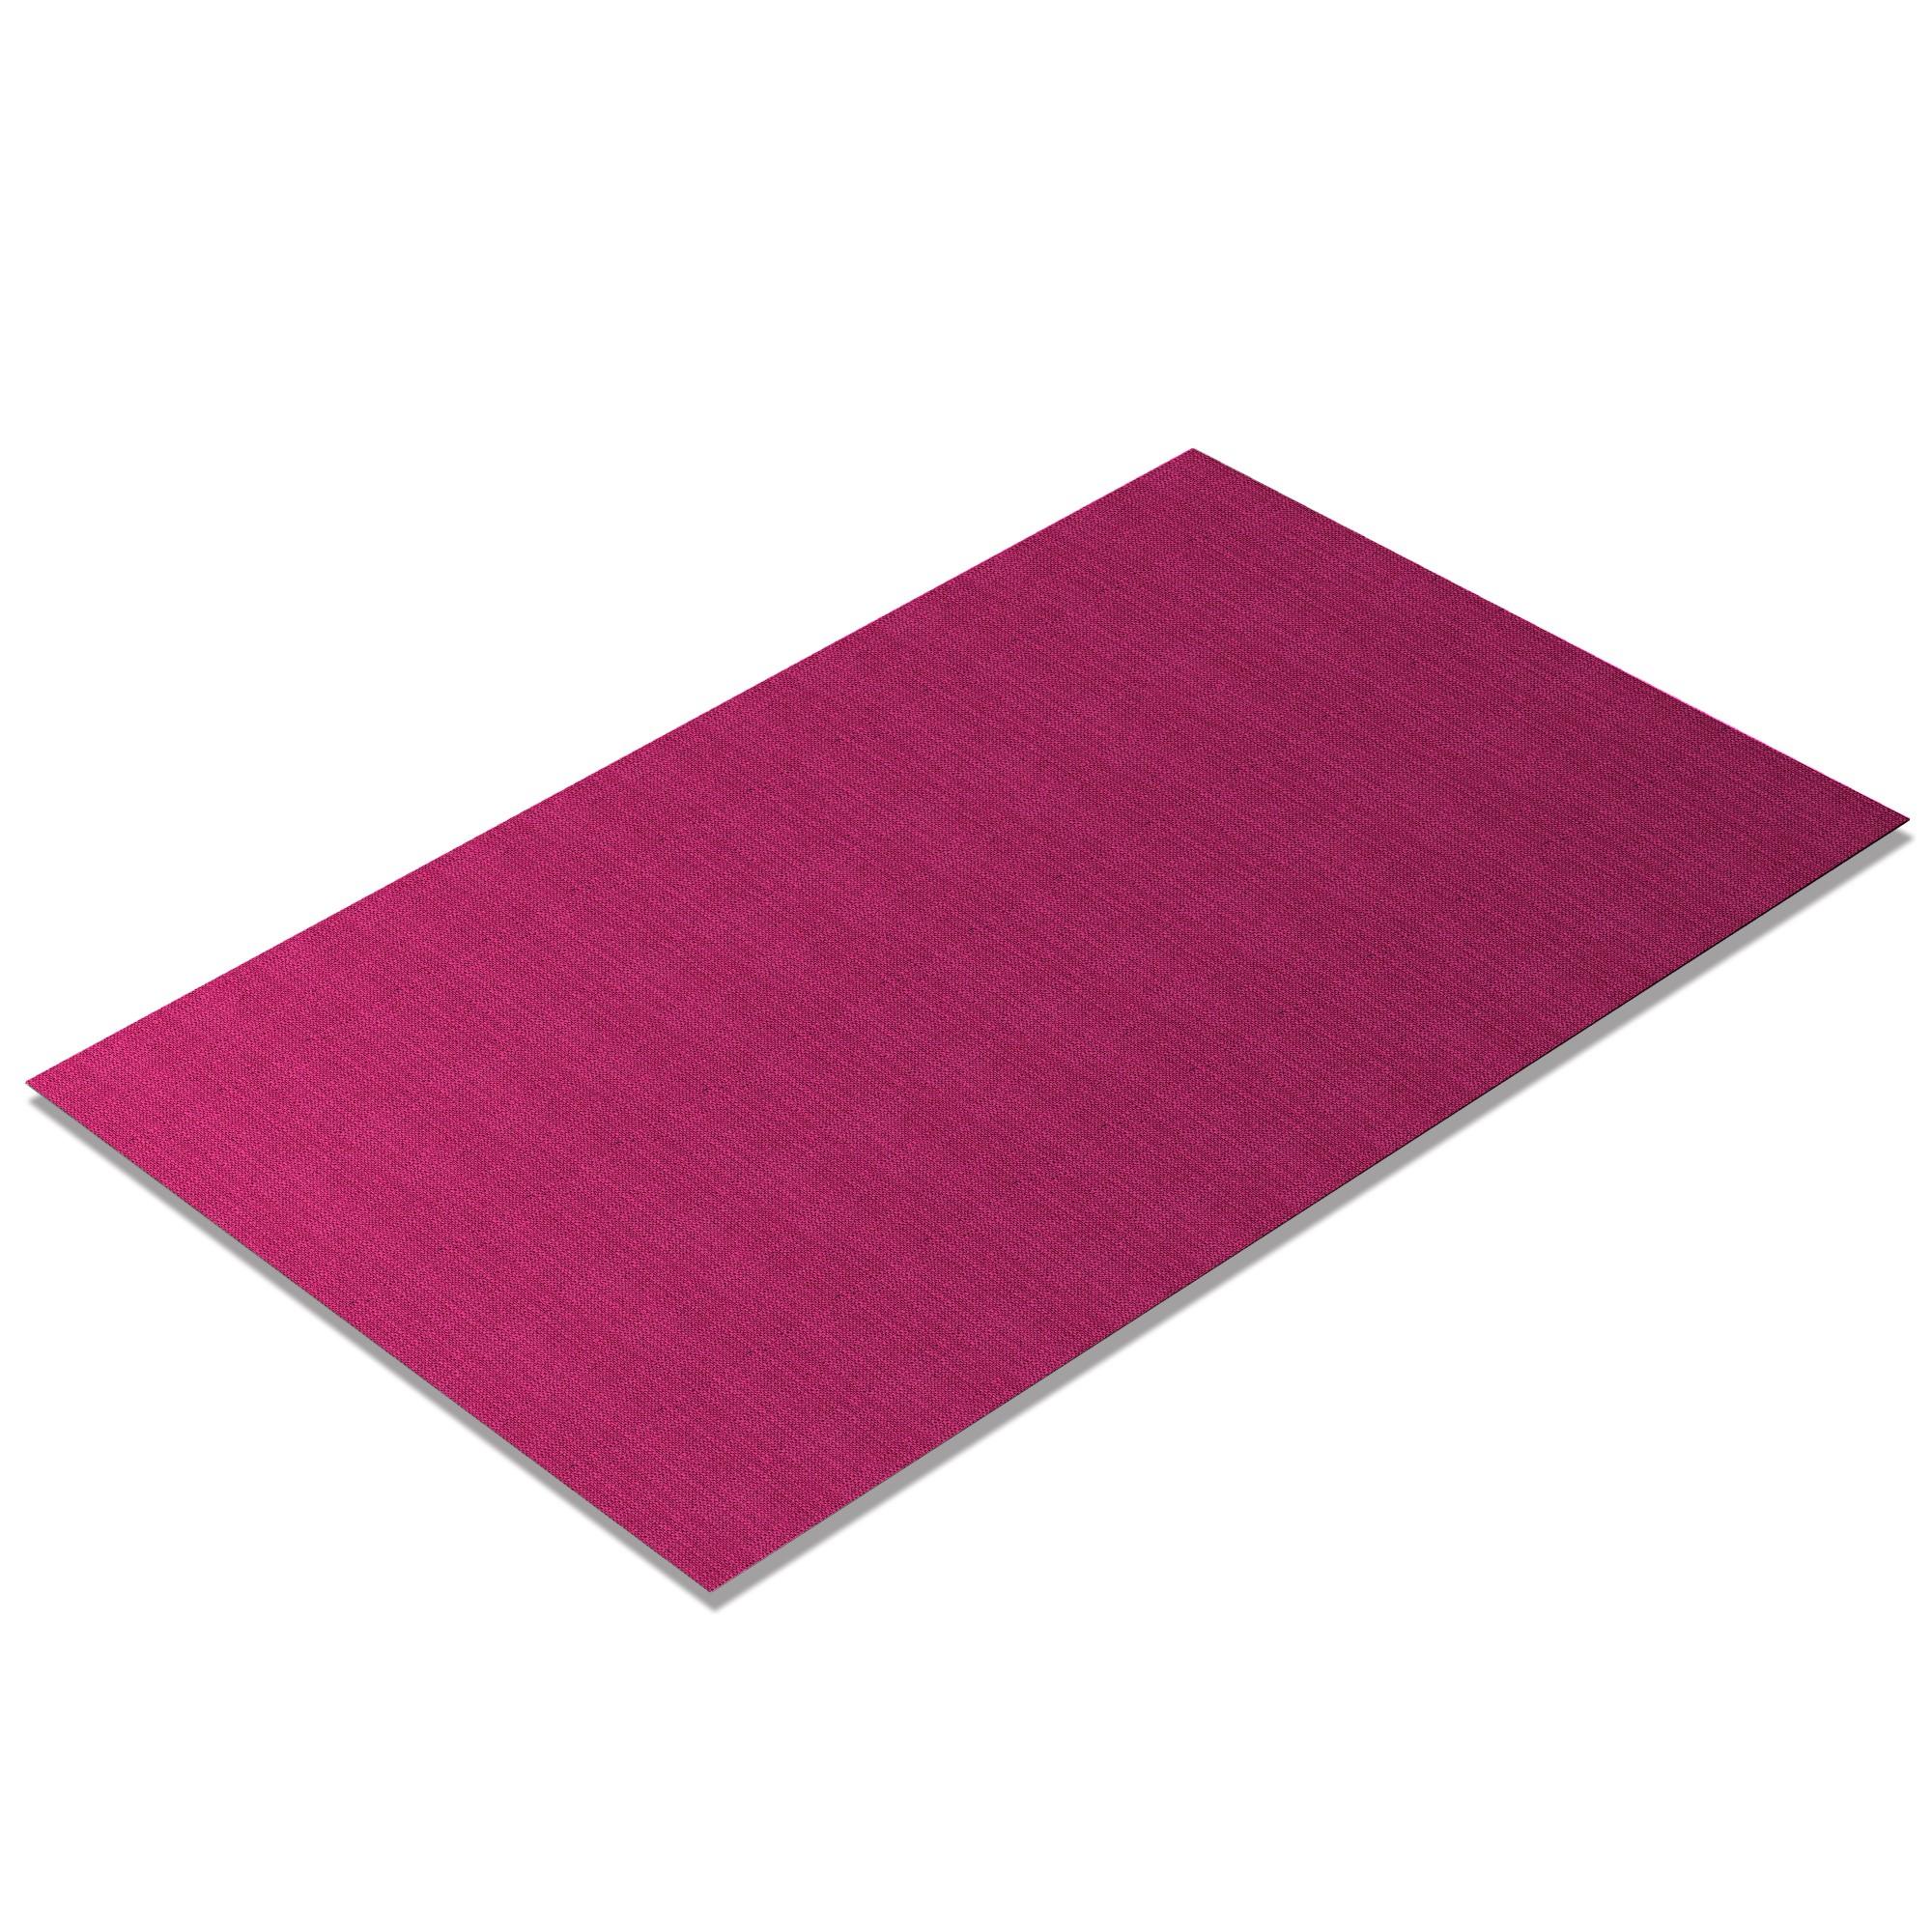 Stoff Meterware Lino Pink [LIN69]